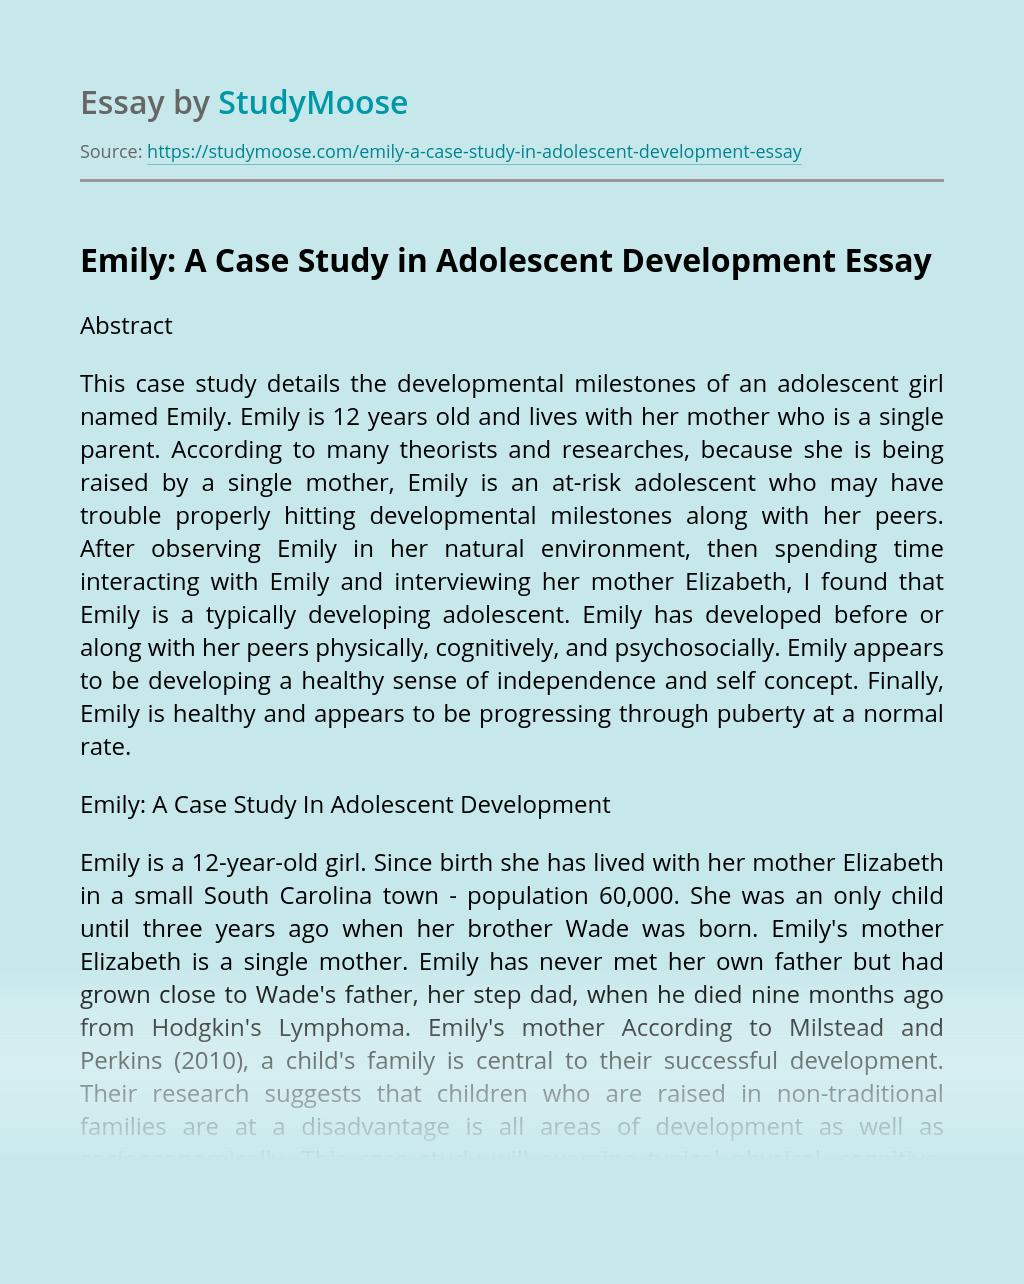 Emily: A Case Study in Adolescent Development